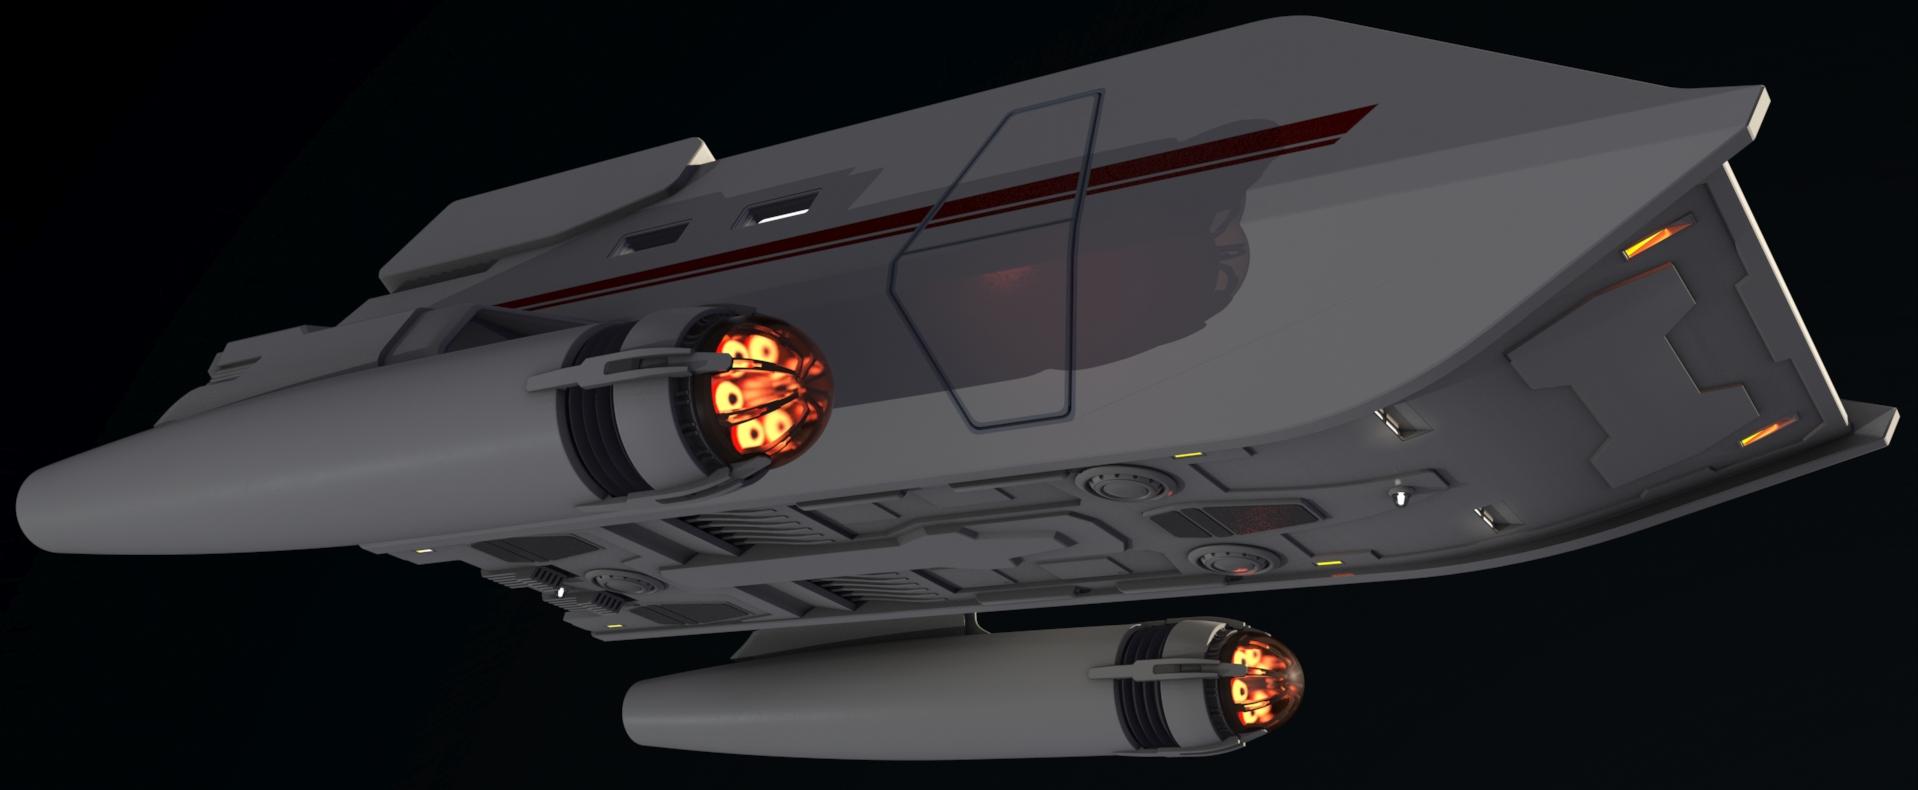 tos-shuttle-006.jpg